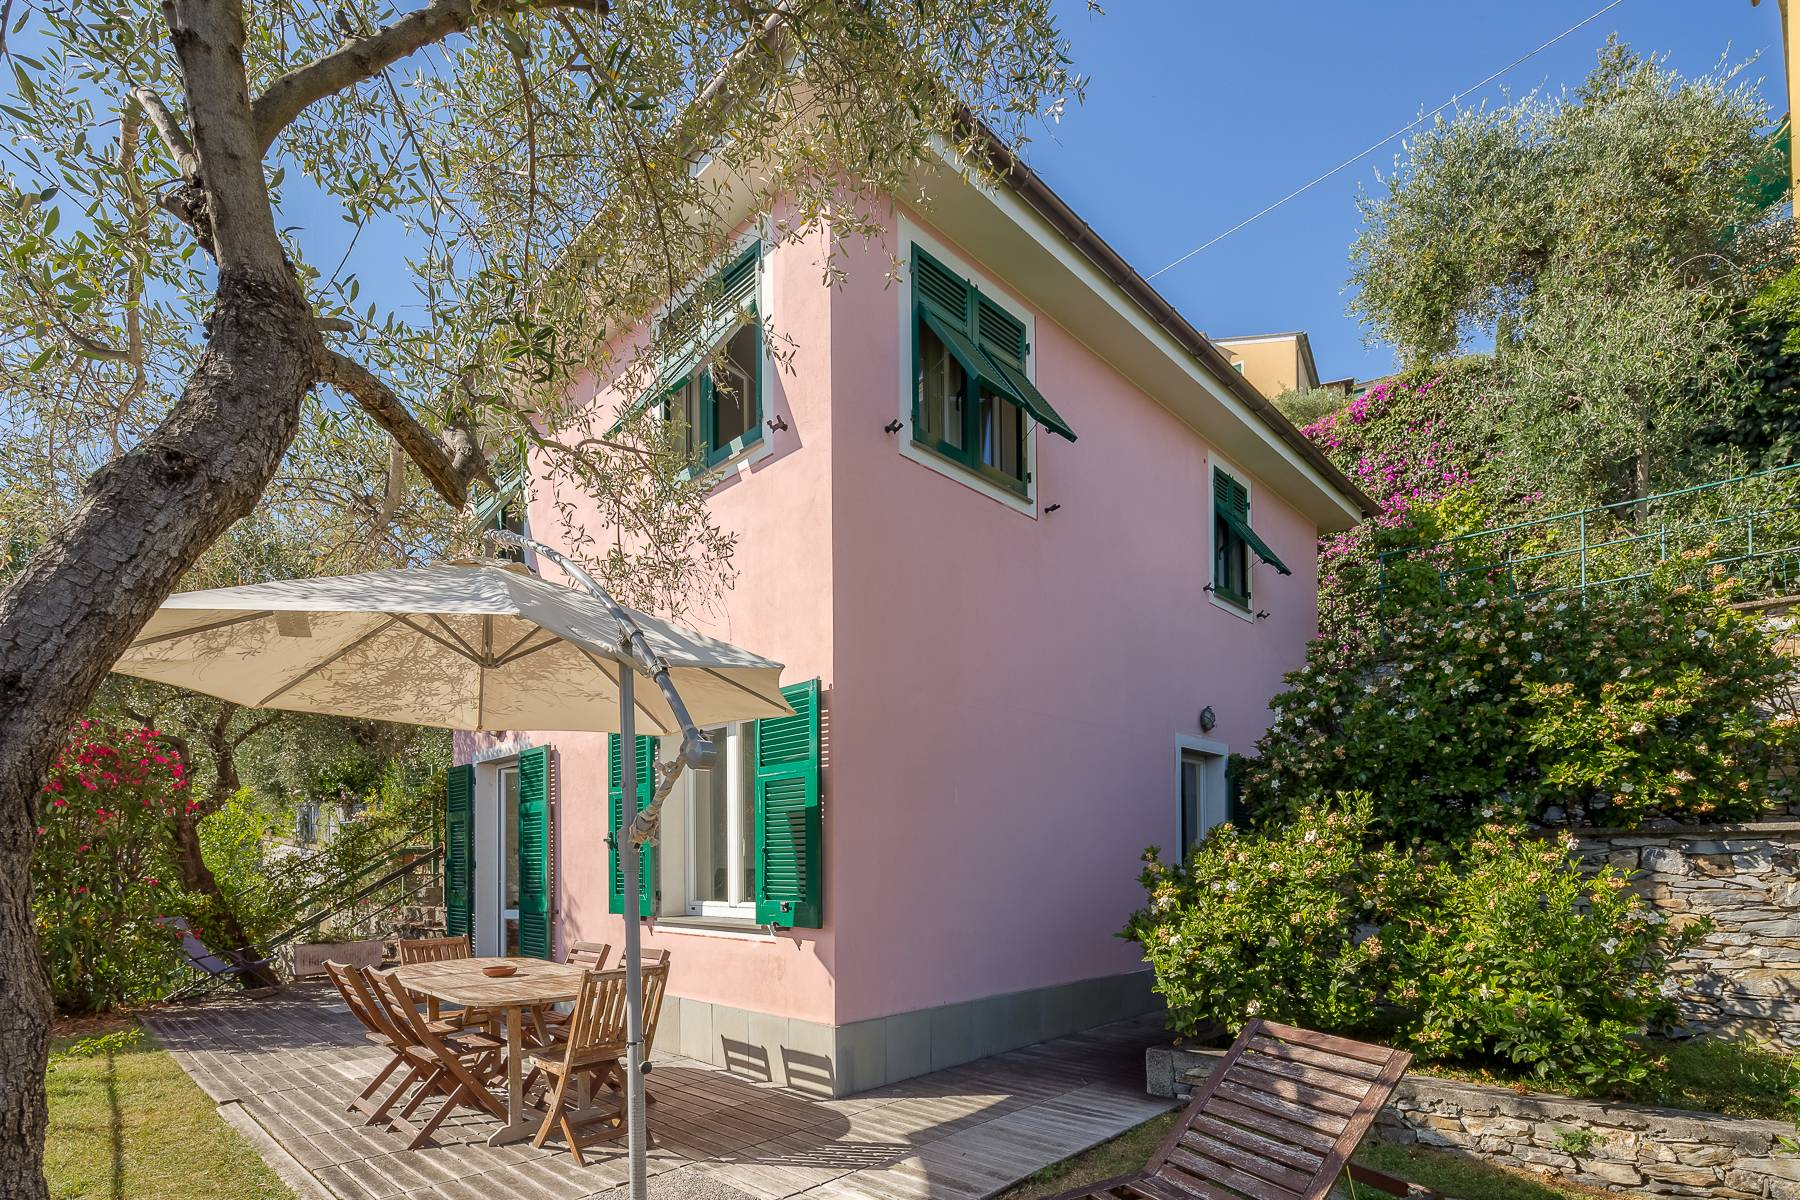 Casa indipendente in Vendita a Zoagli: 5 locali, 100 mq - Foto 3